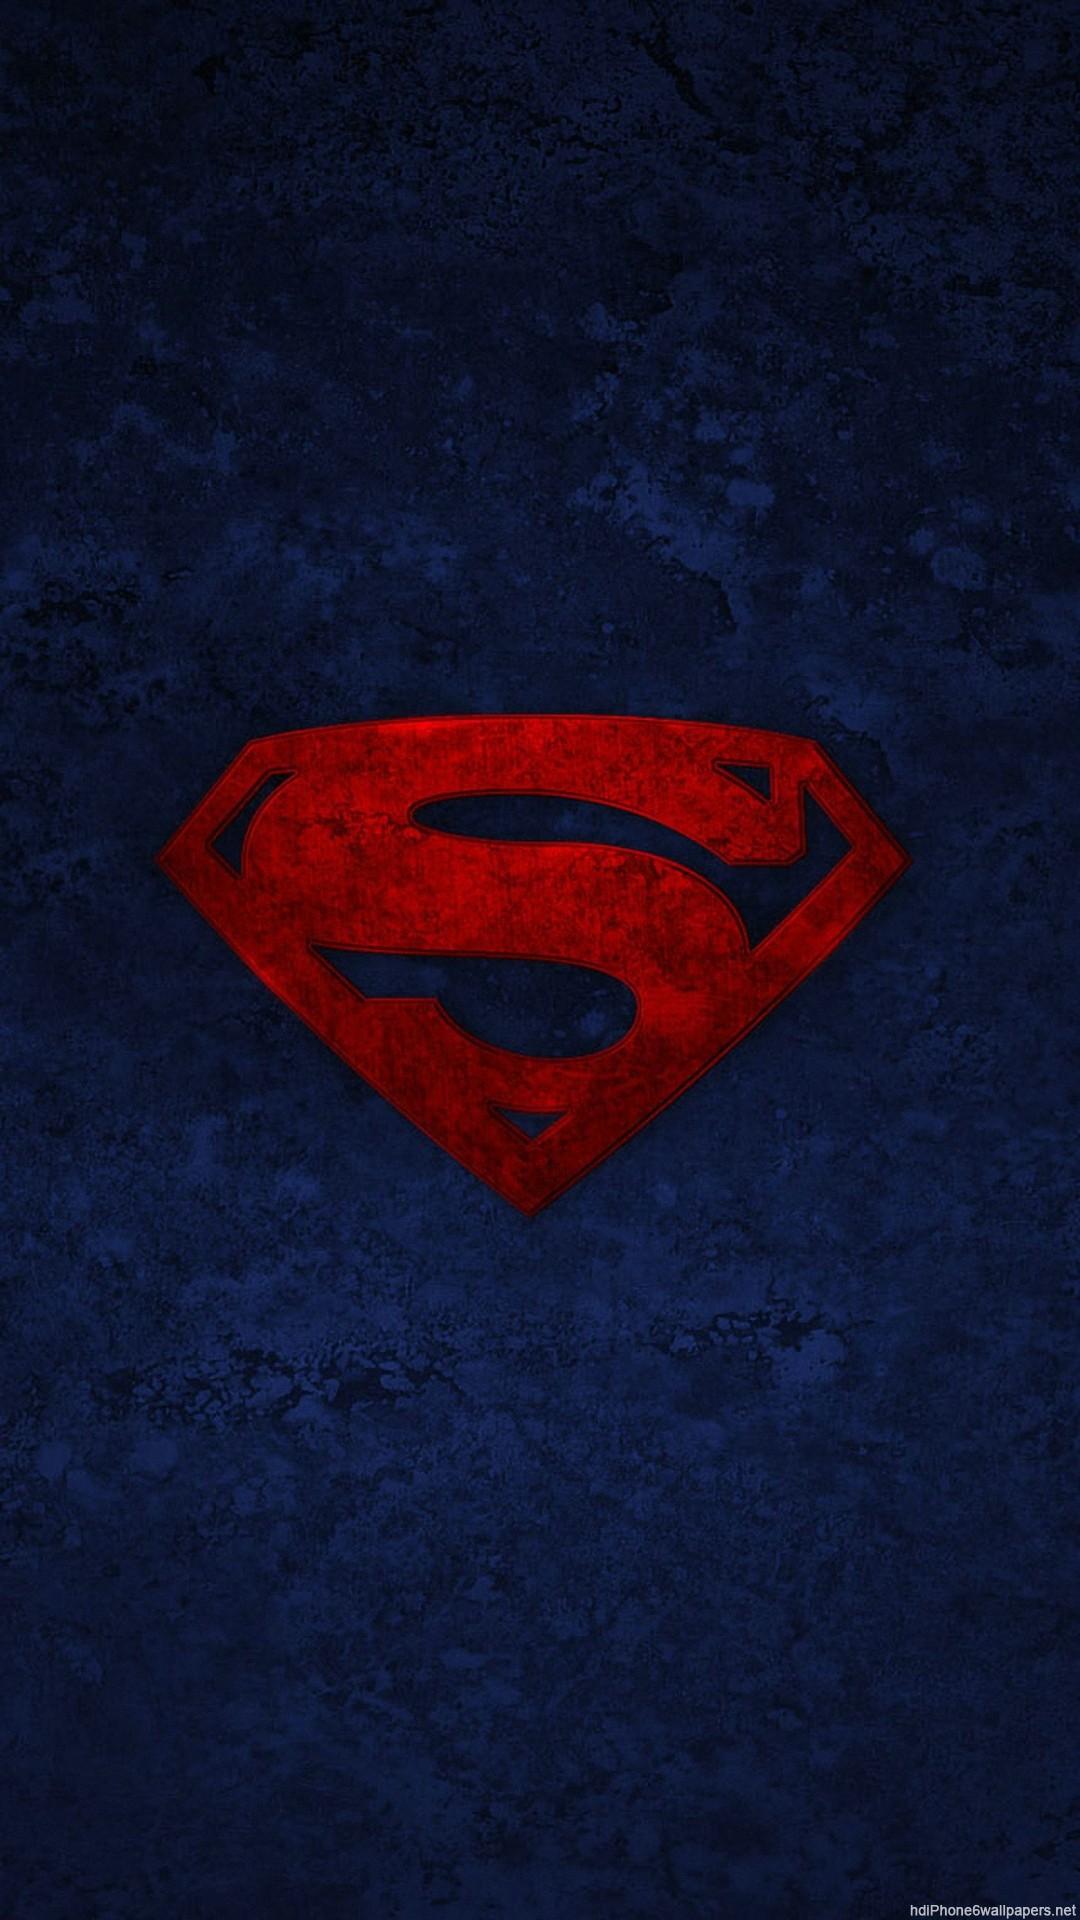 Superman Logo iPhone Wallpaper HD 65 images 1080x1920